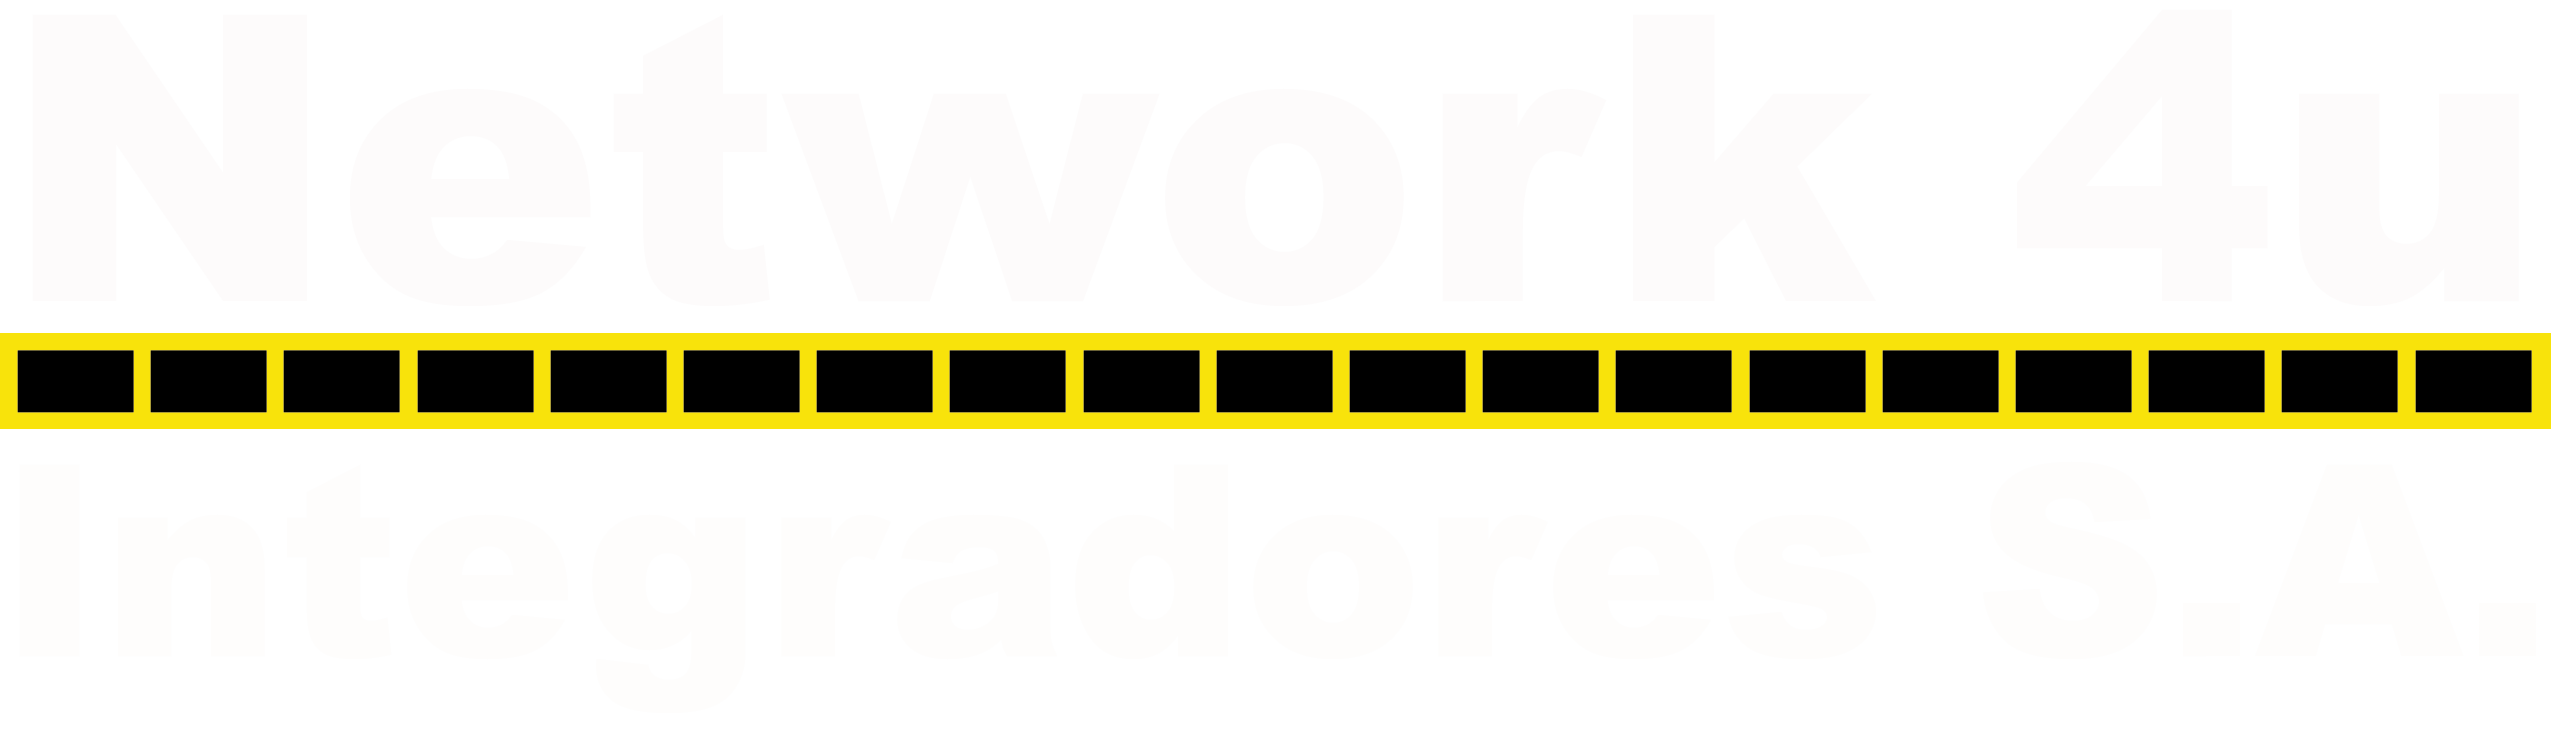 Logo_Transp_N4U-Letras_Blanco